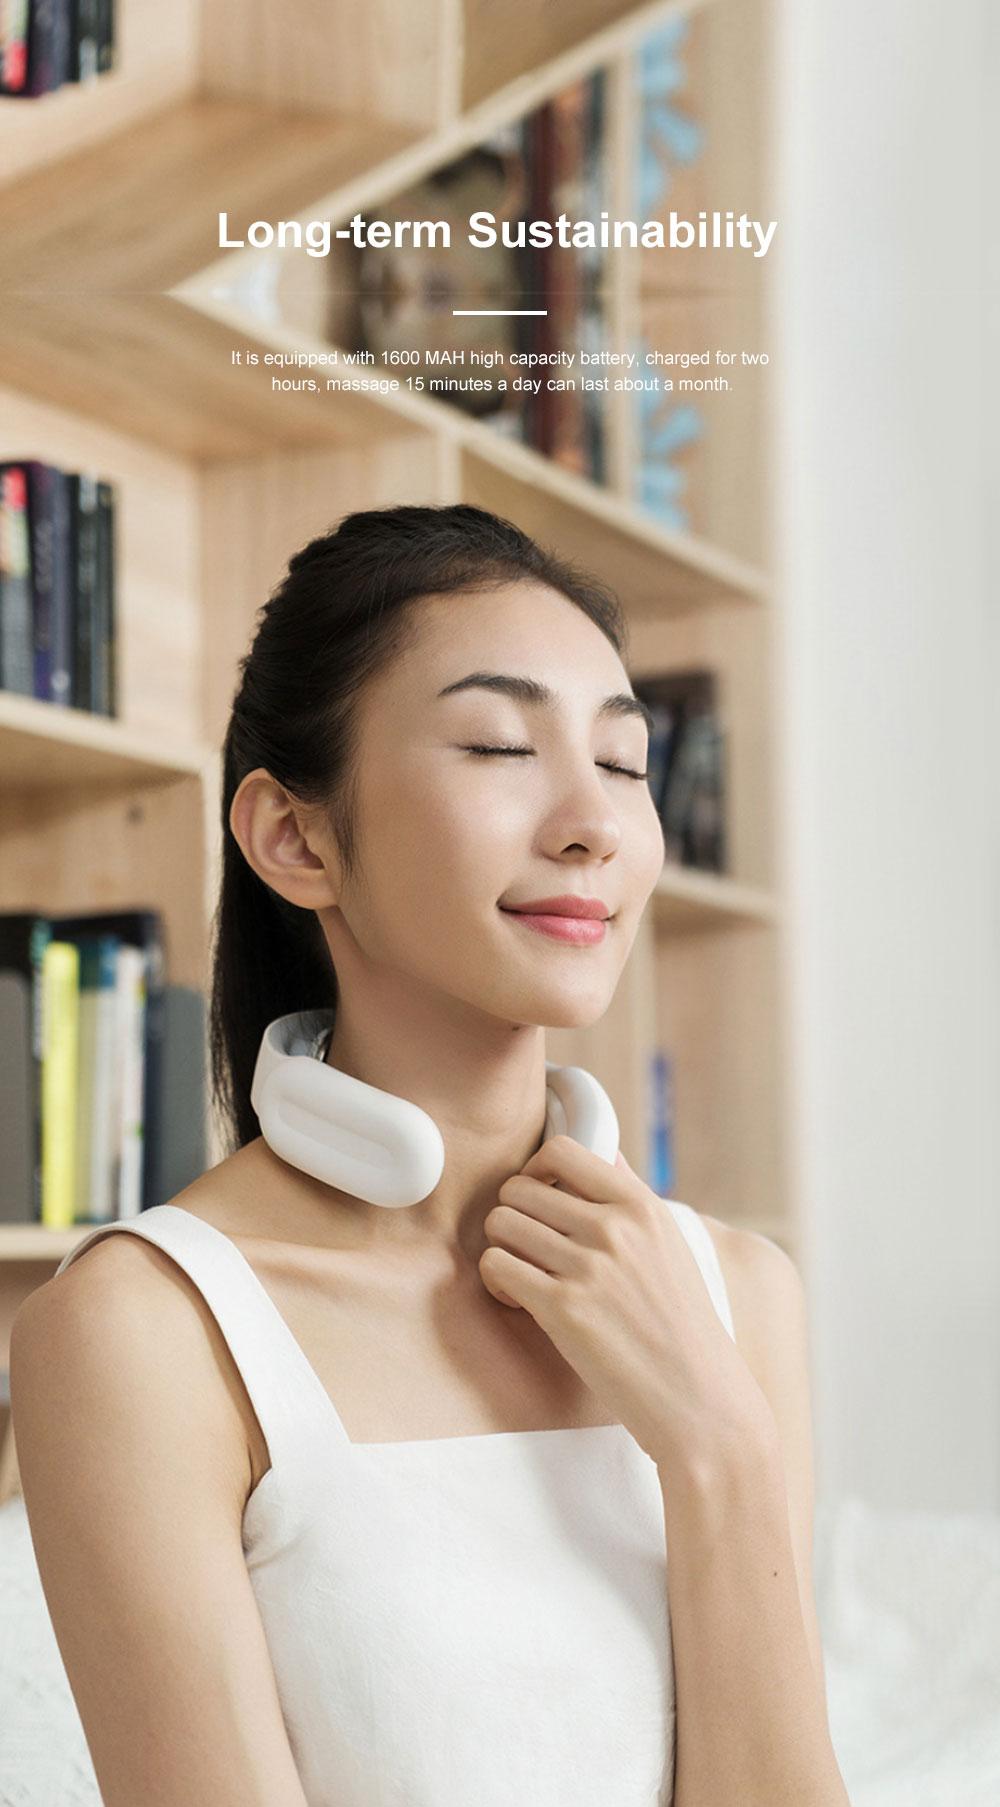 Household Electric Neck Massage Instrument Intelligent Multifunctional Nursing Instrument for Neck Shoulder Waist and Neck 3